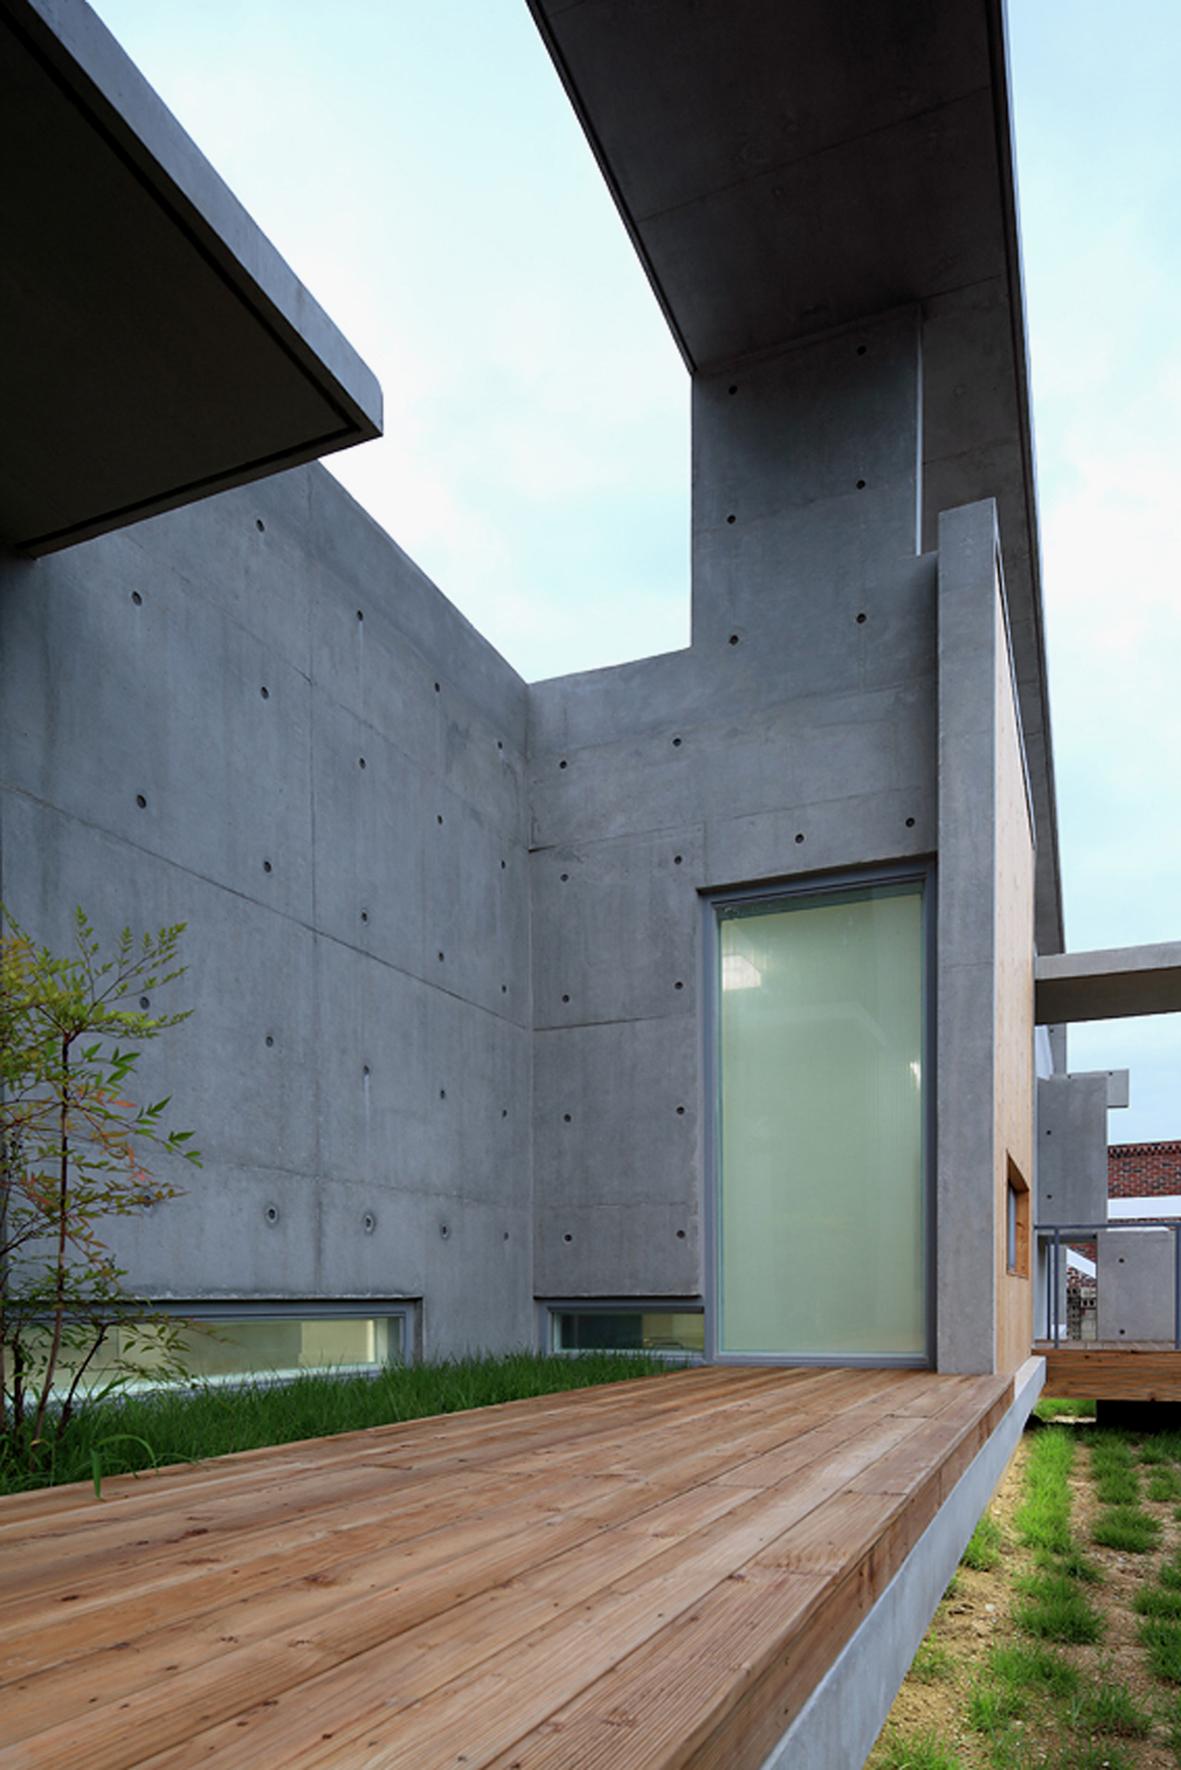 52f1a5f4e8e44e0b6d0000d8_mun-jeong-heon-a-m-architects_a7